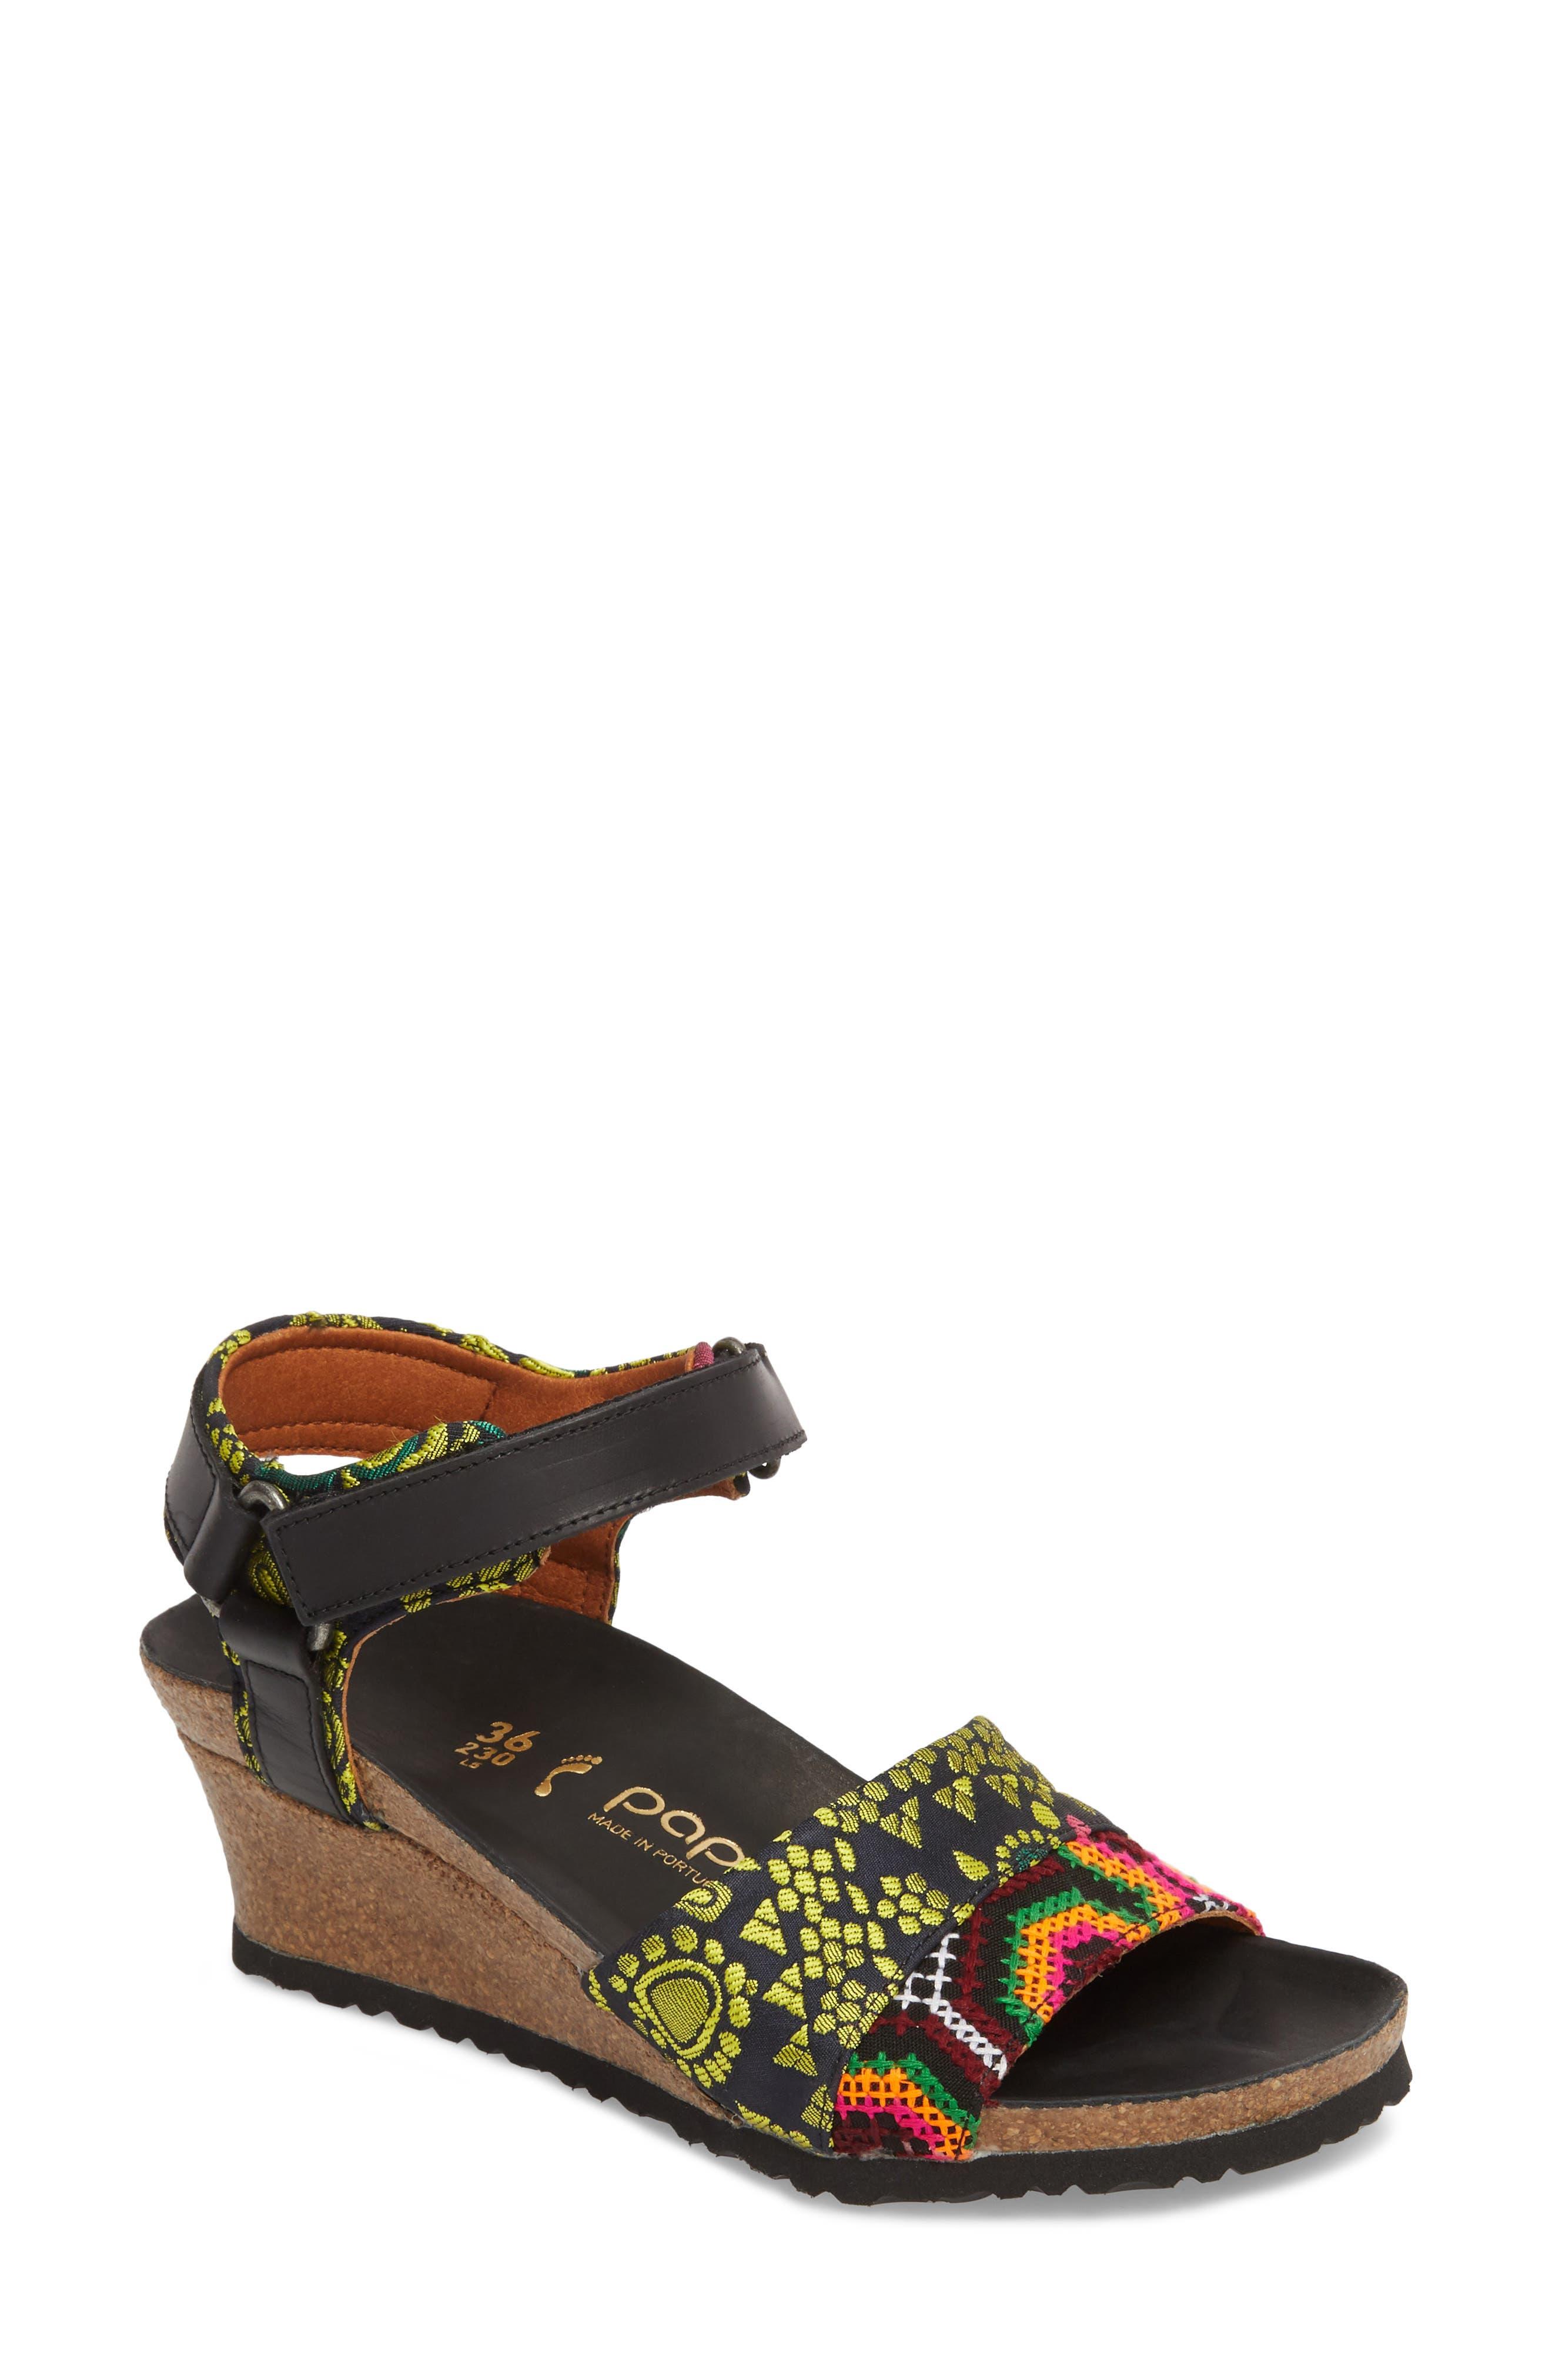 Eve Wedge Sandal,                         Main,                         color,